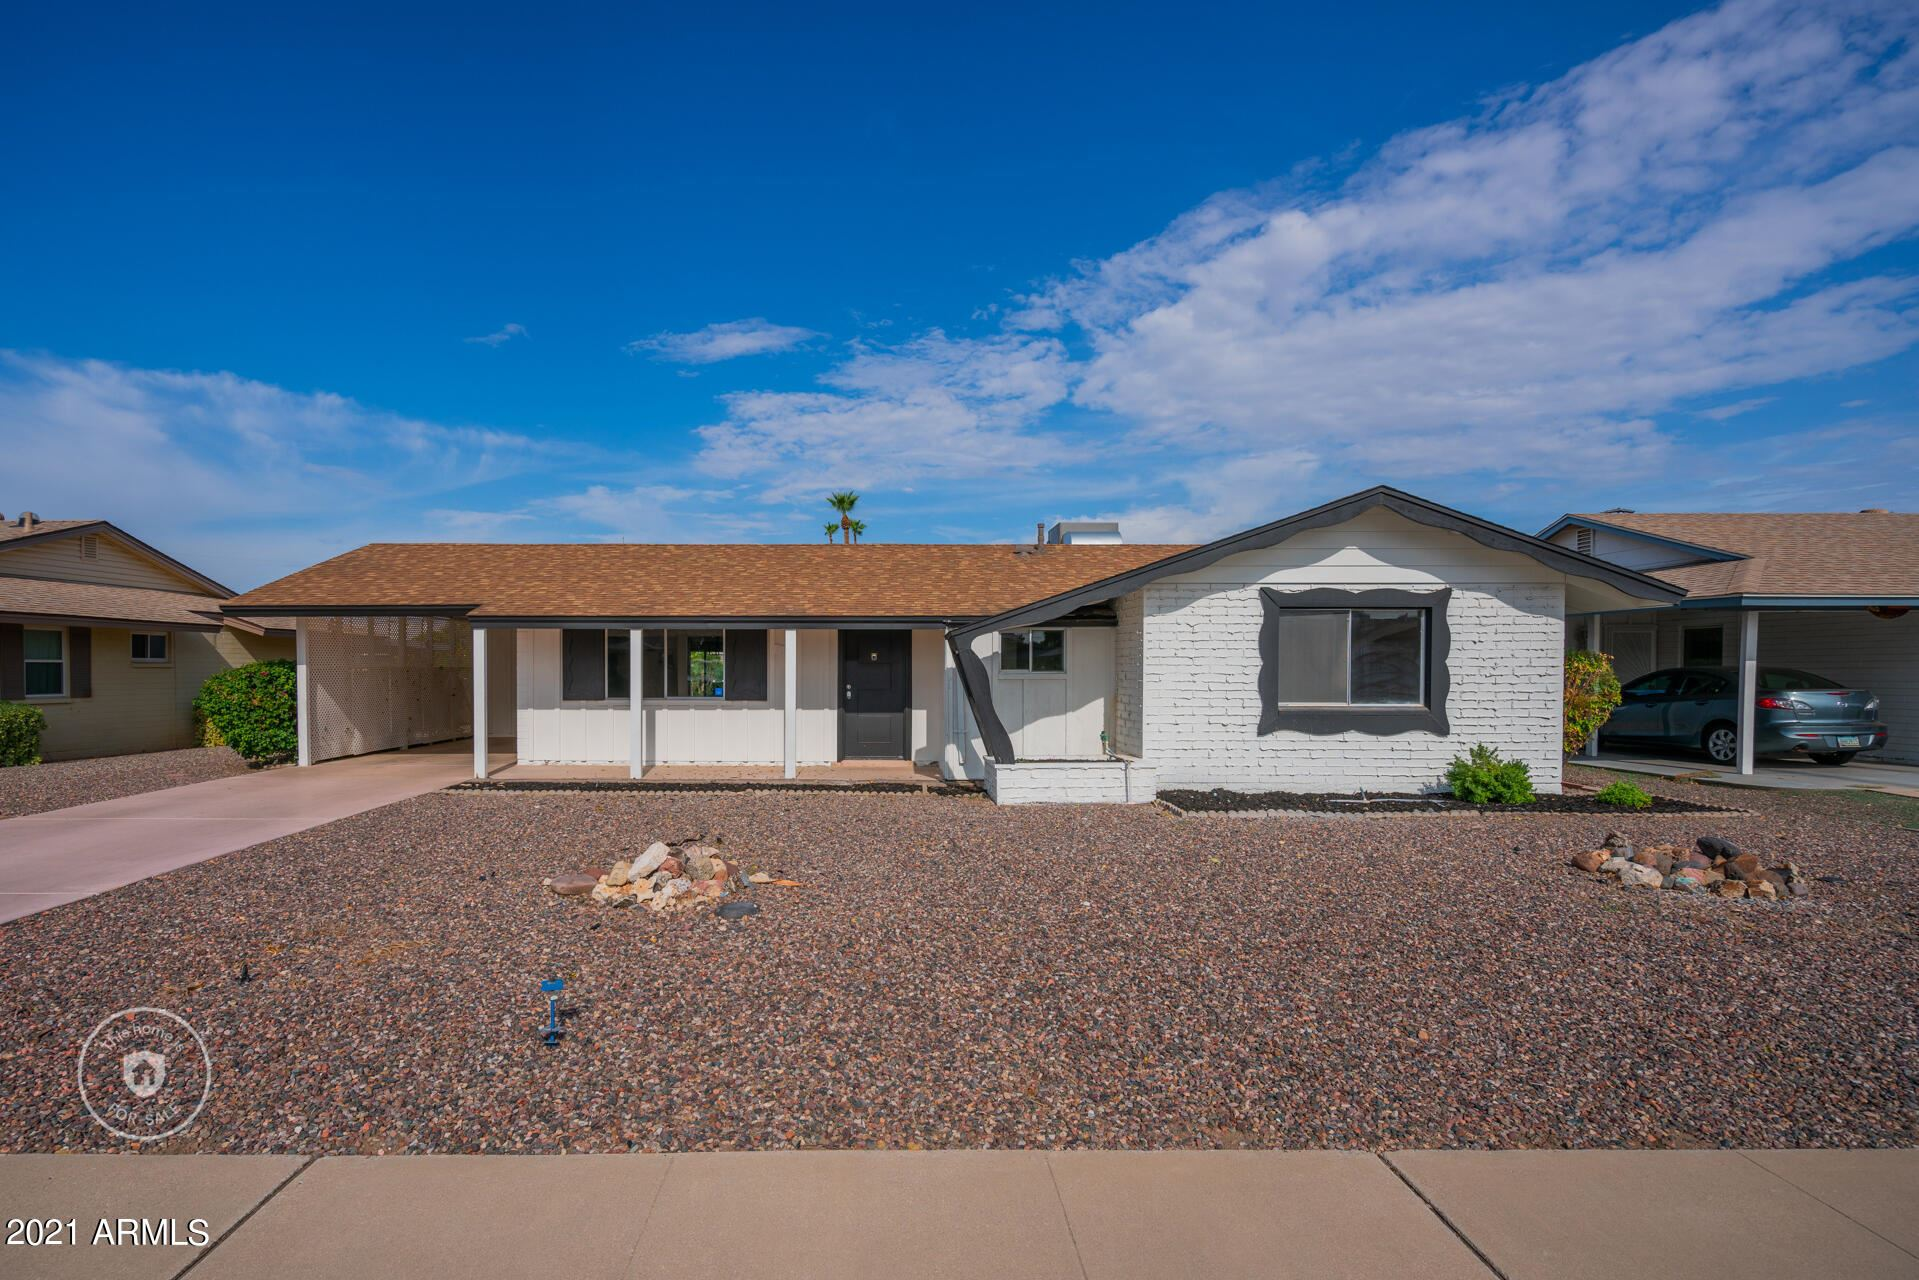 Photo of 11620 N COGGINS Drive, Sun City, AZ 85351 (MLS # 6268473)